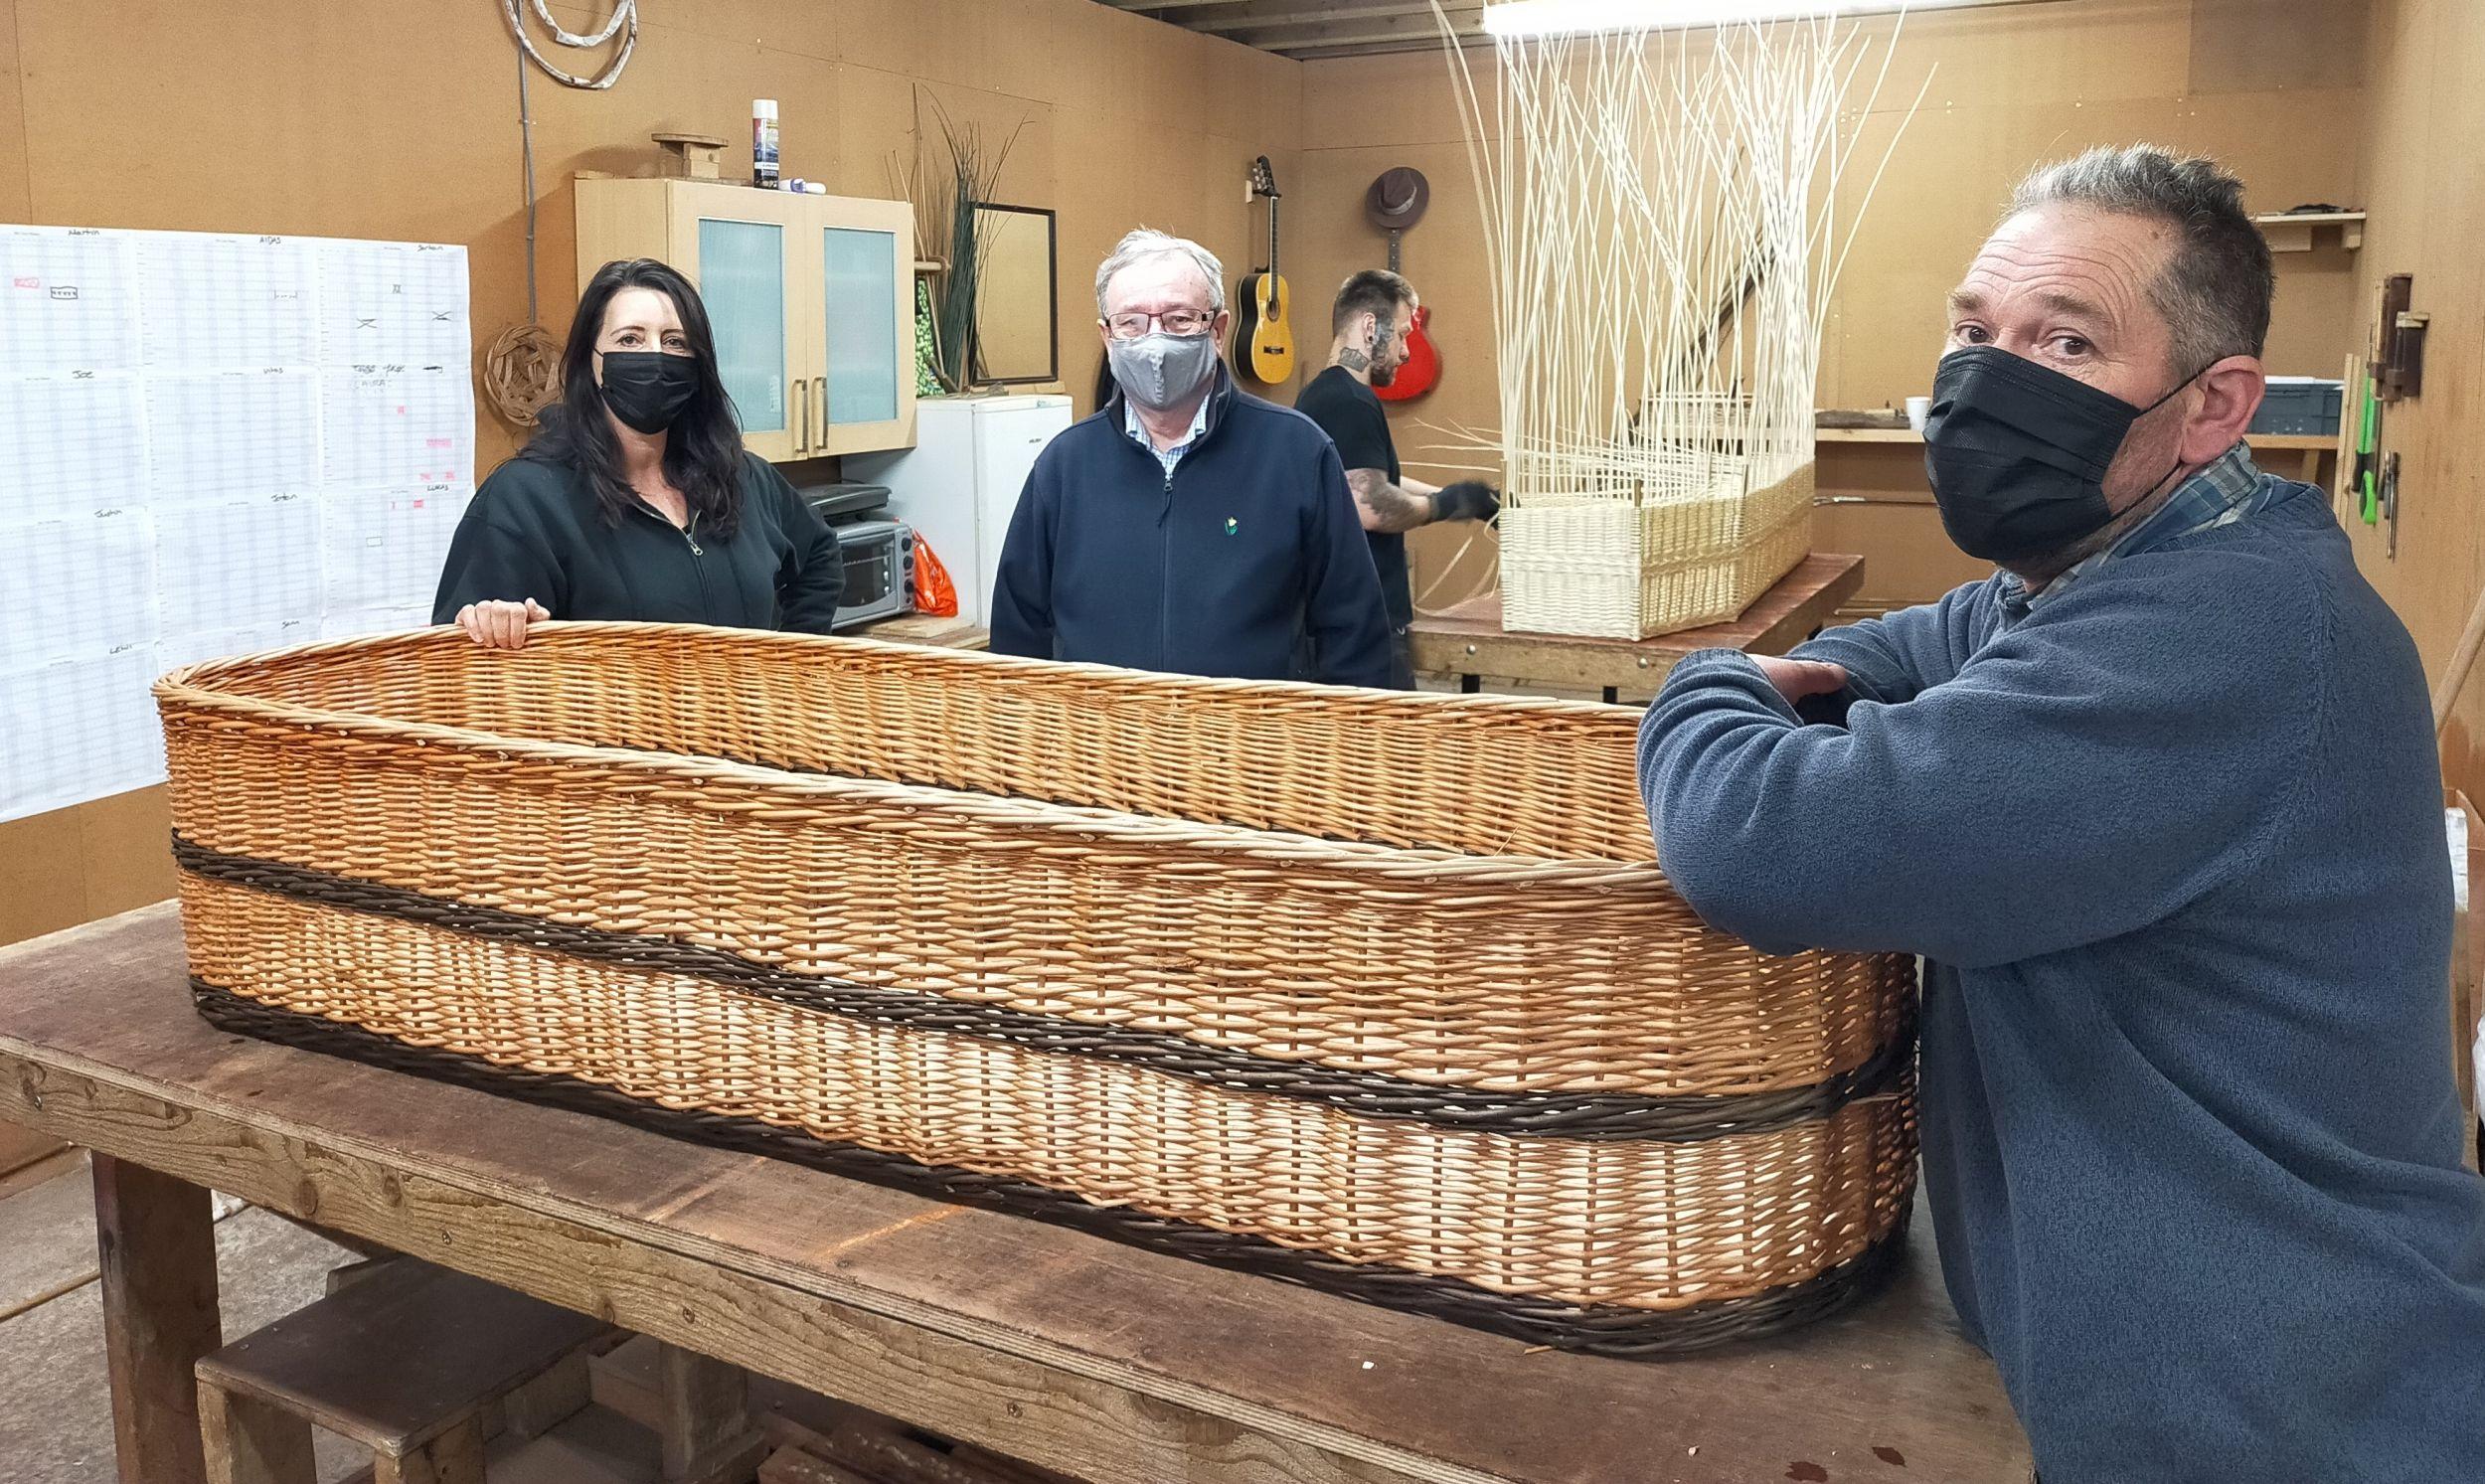 Funeral Furnishing Manufacturers' Association Chief Ex. Alun Tucker